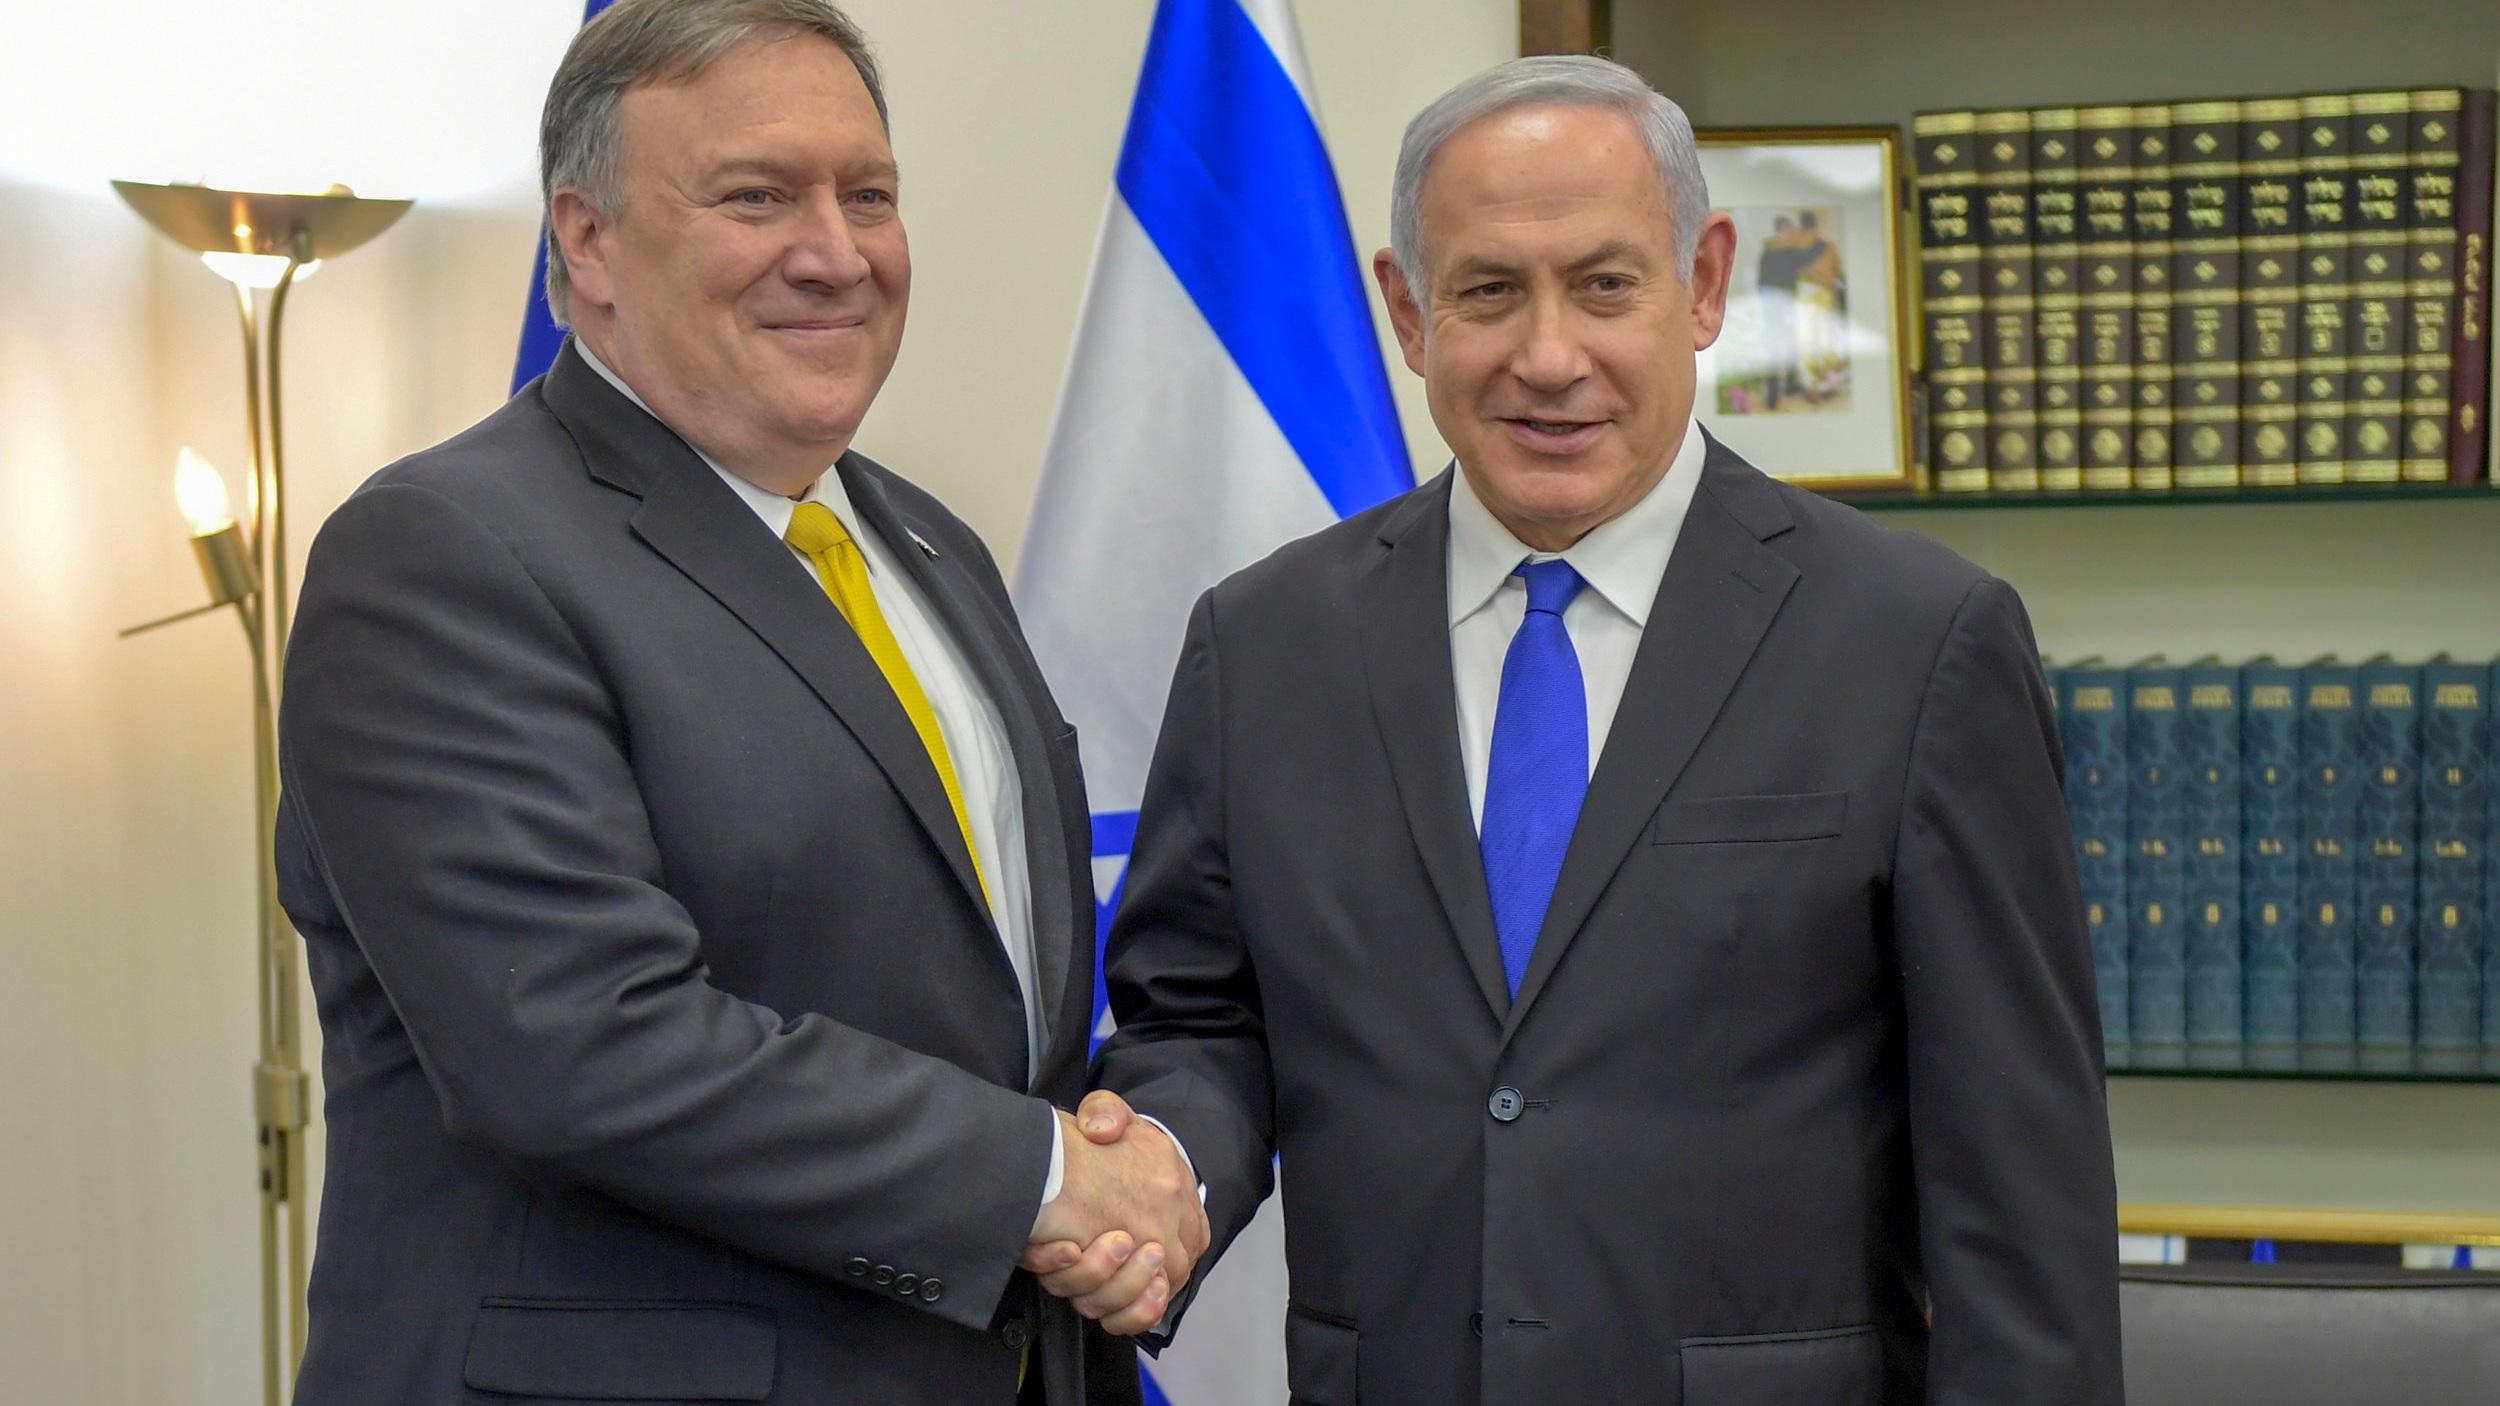 Secretary_Pompeo_Meets_with_Israeli_Prime_Minister_Netanyahu_%2826909878457%29.jpg